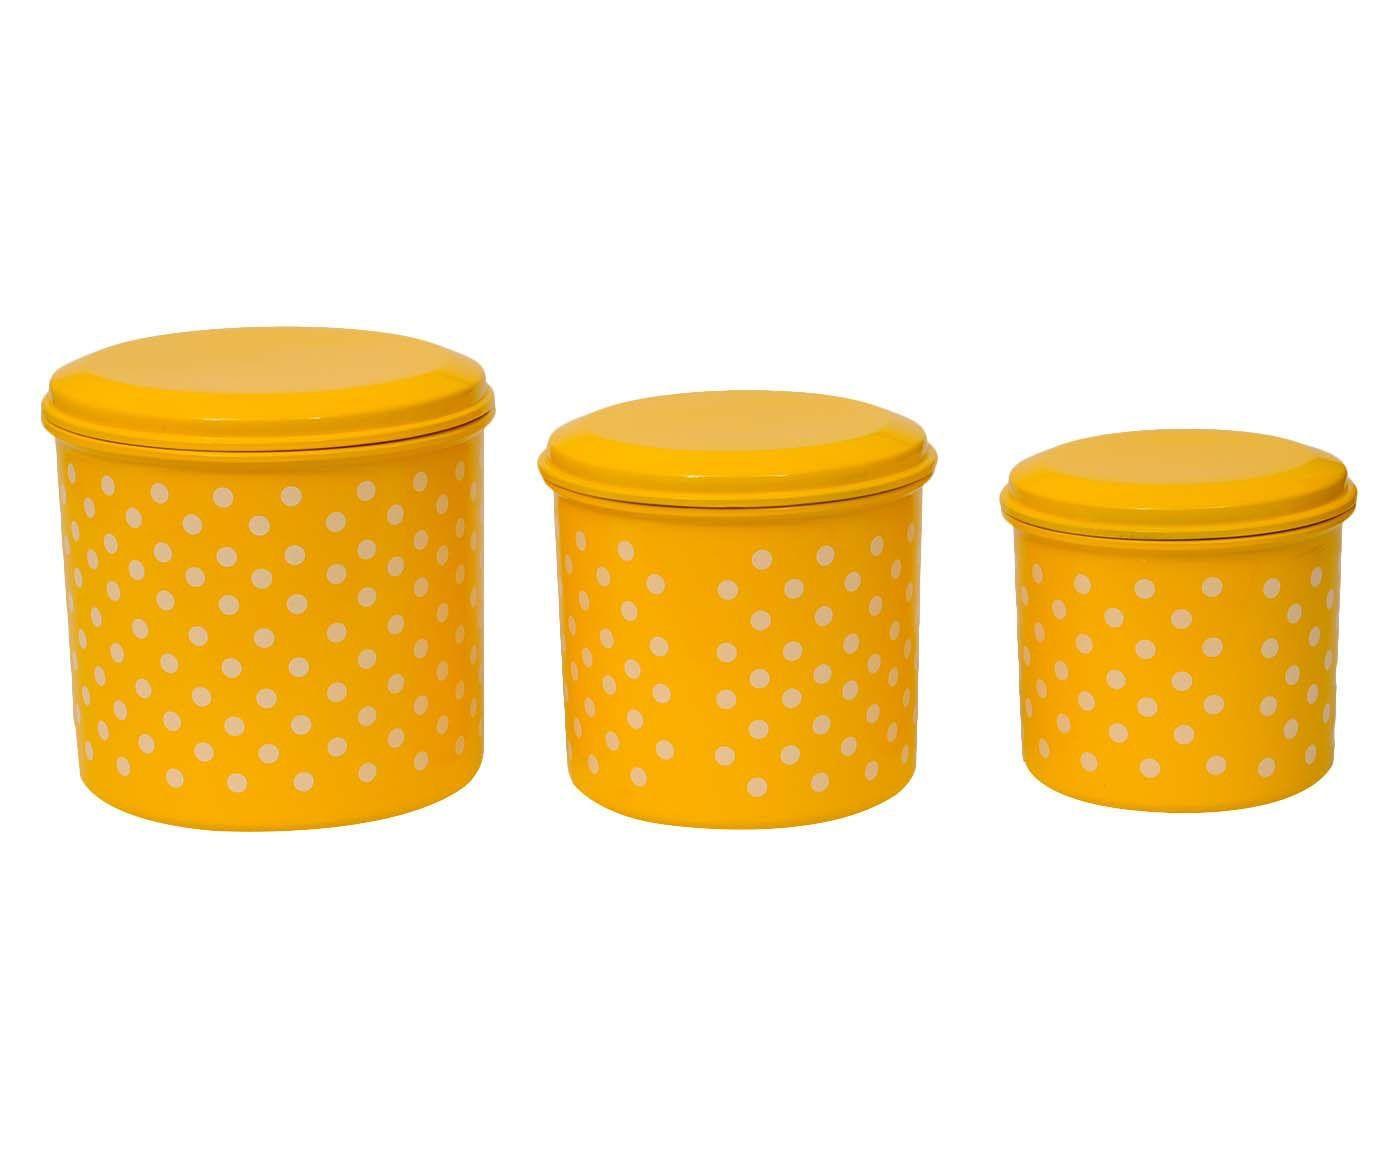 Jogo de Porta-Condimentos Polka Dots - Amarelo e Branco | Westwing.com.br